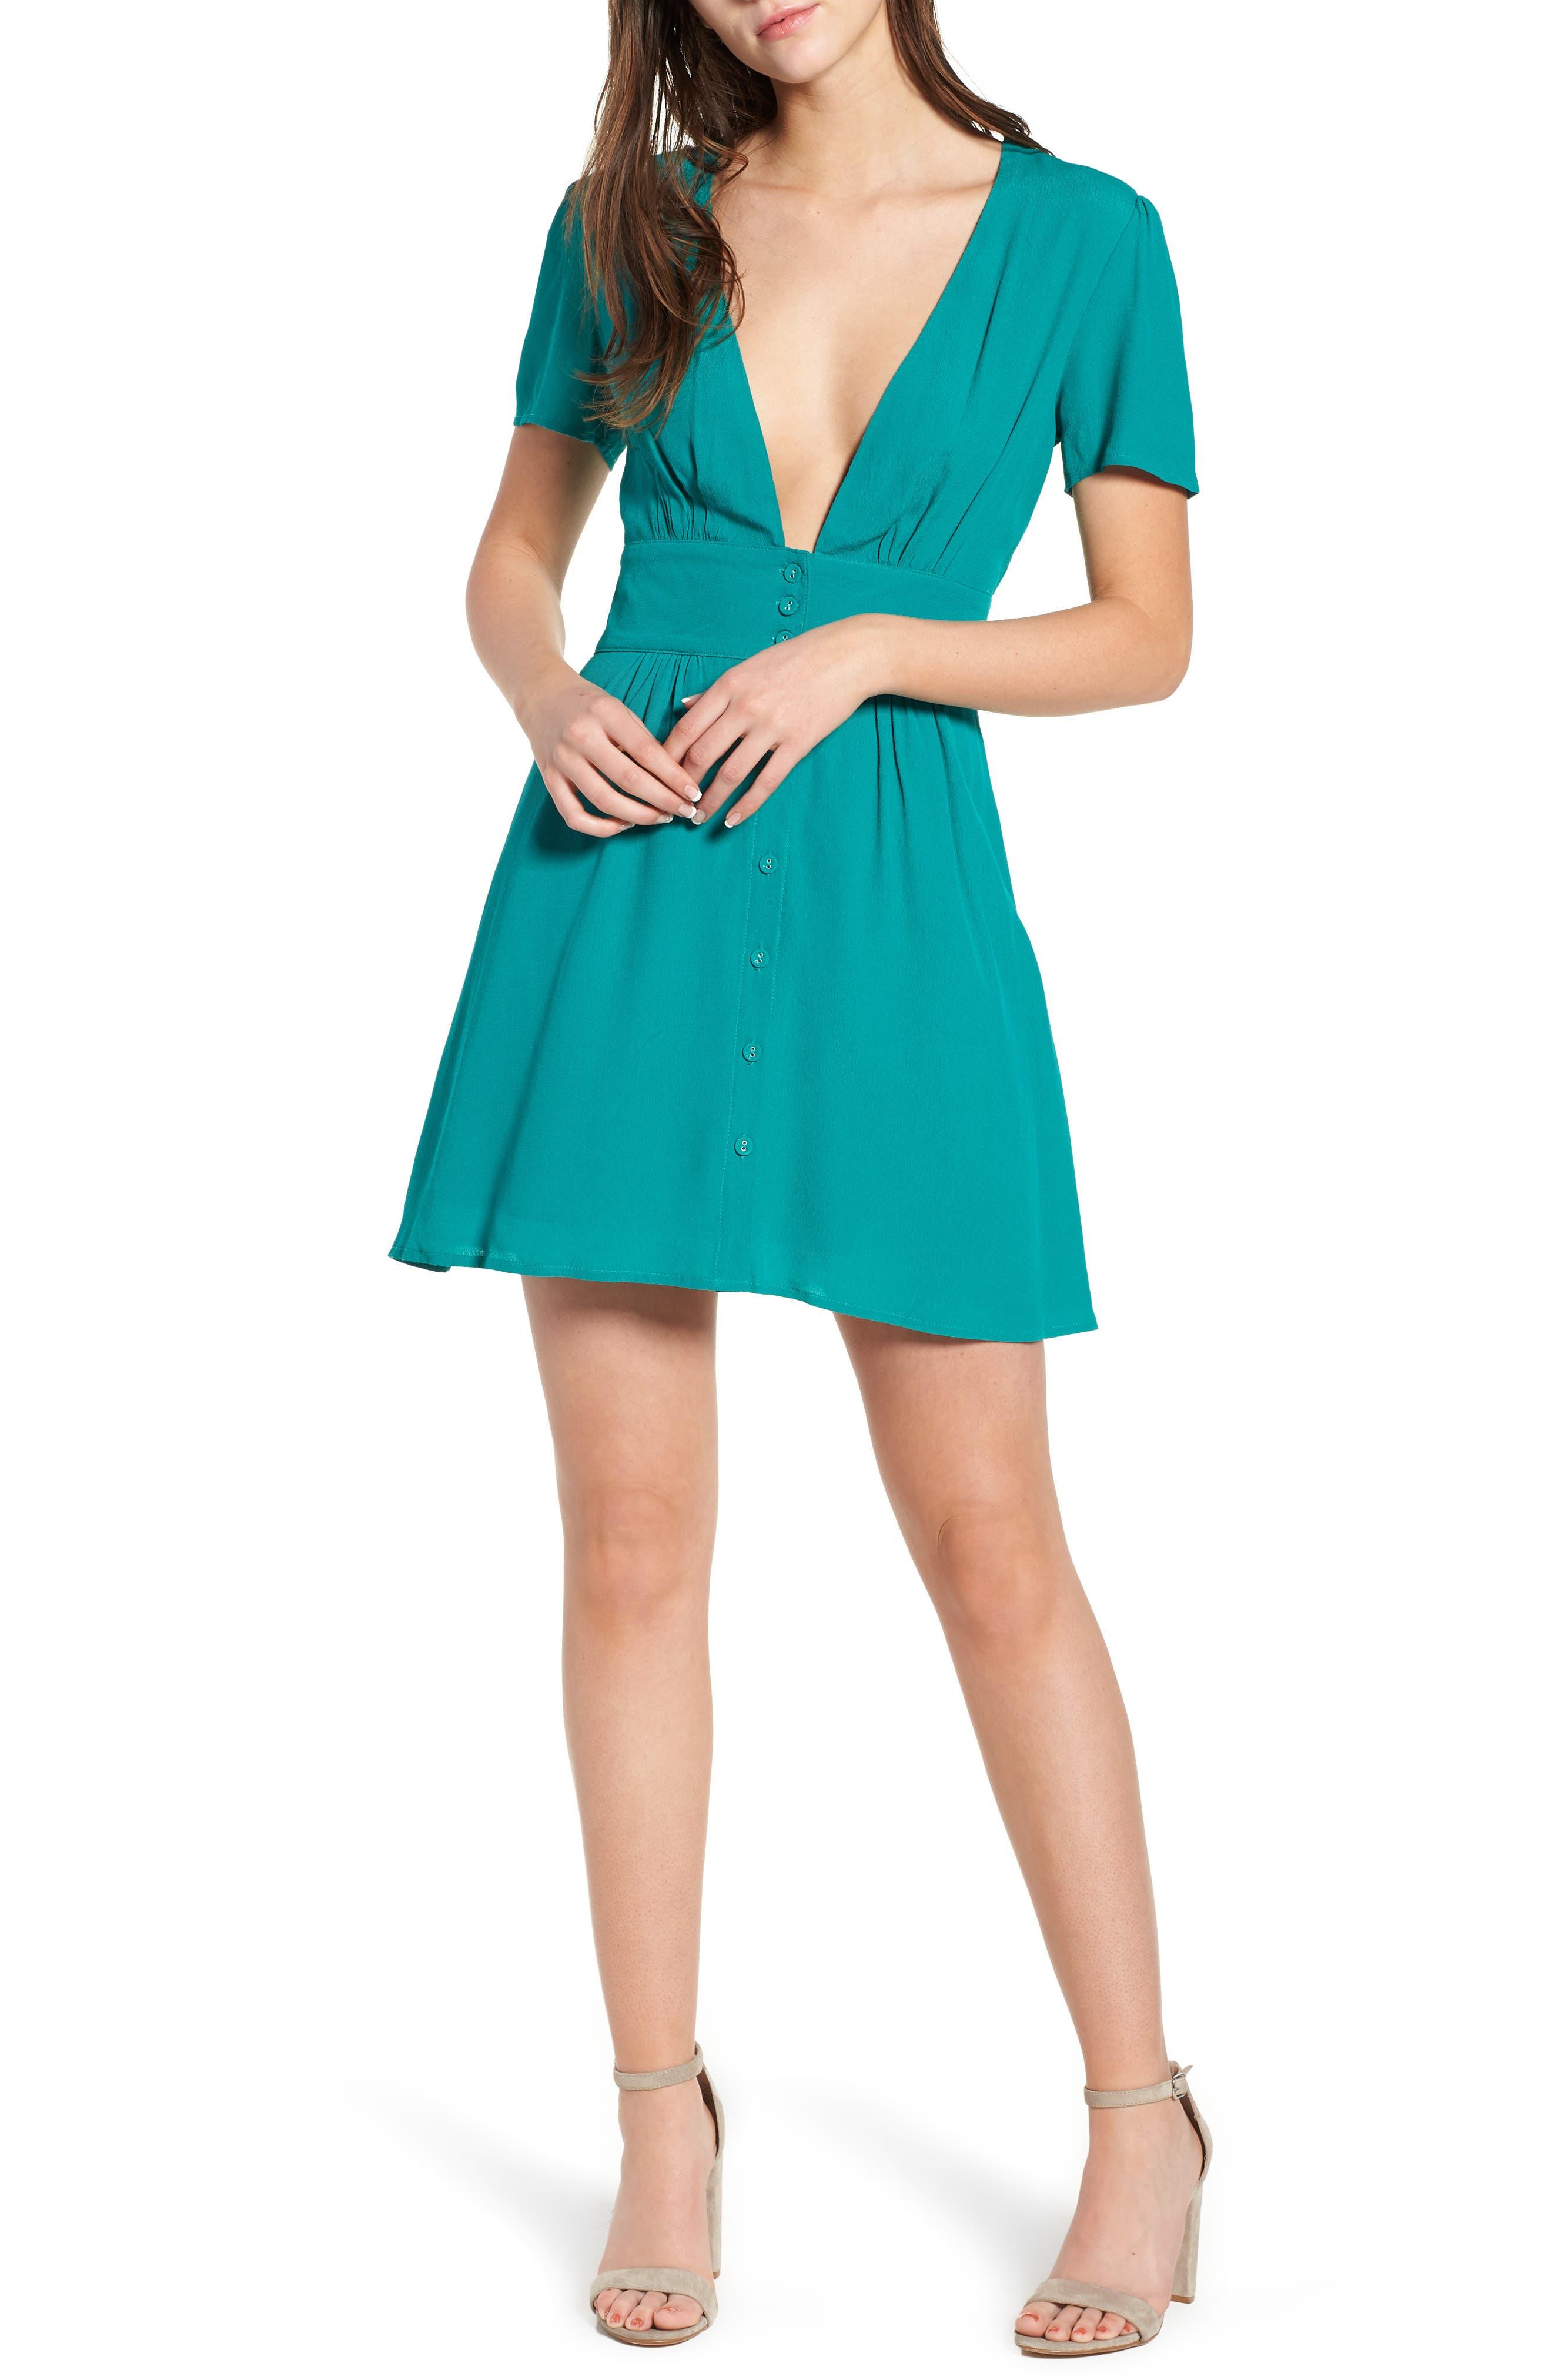 Verdera Plunging Minidress,                         Main,                         color, 300